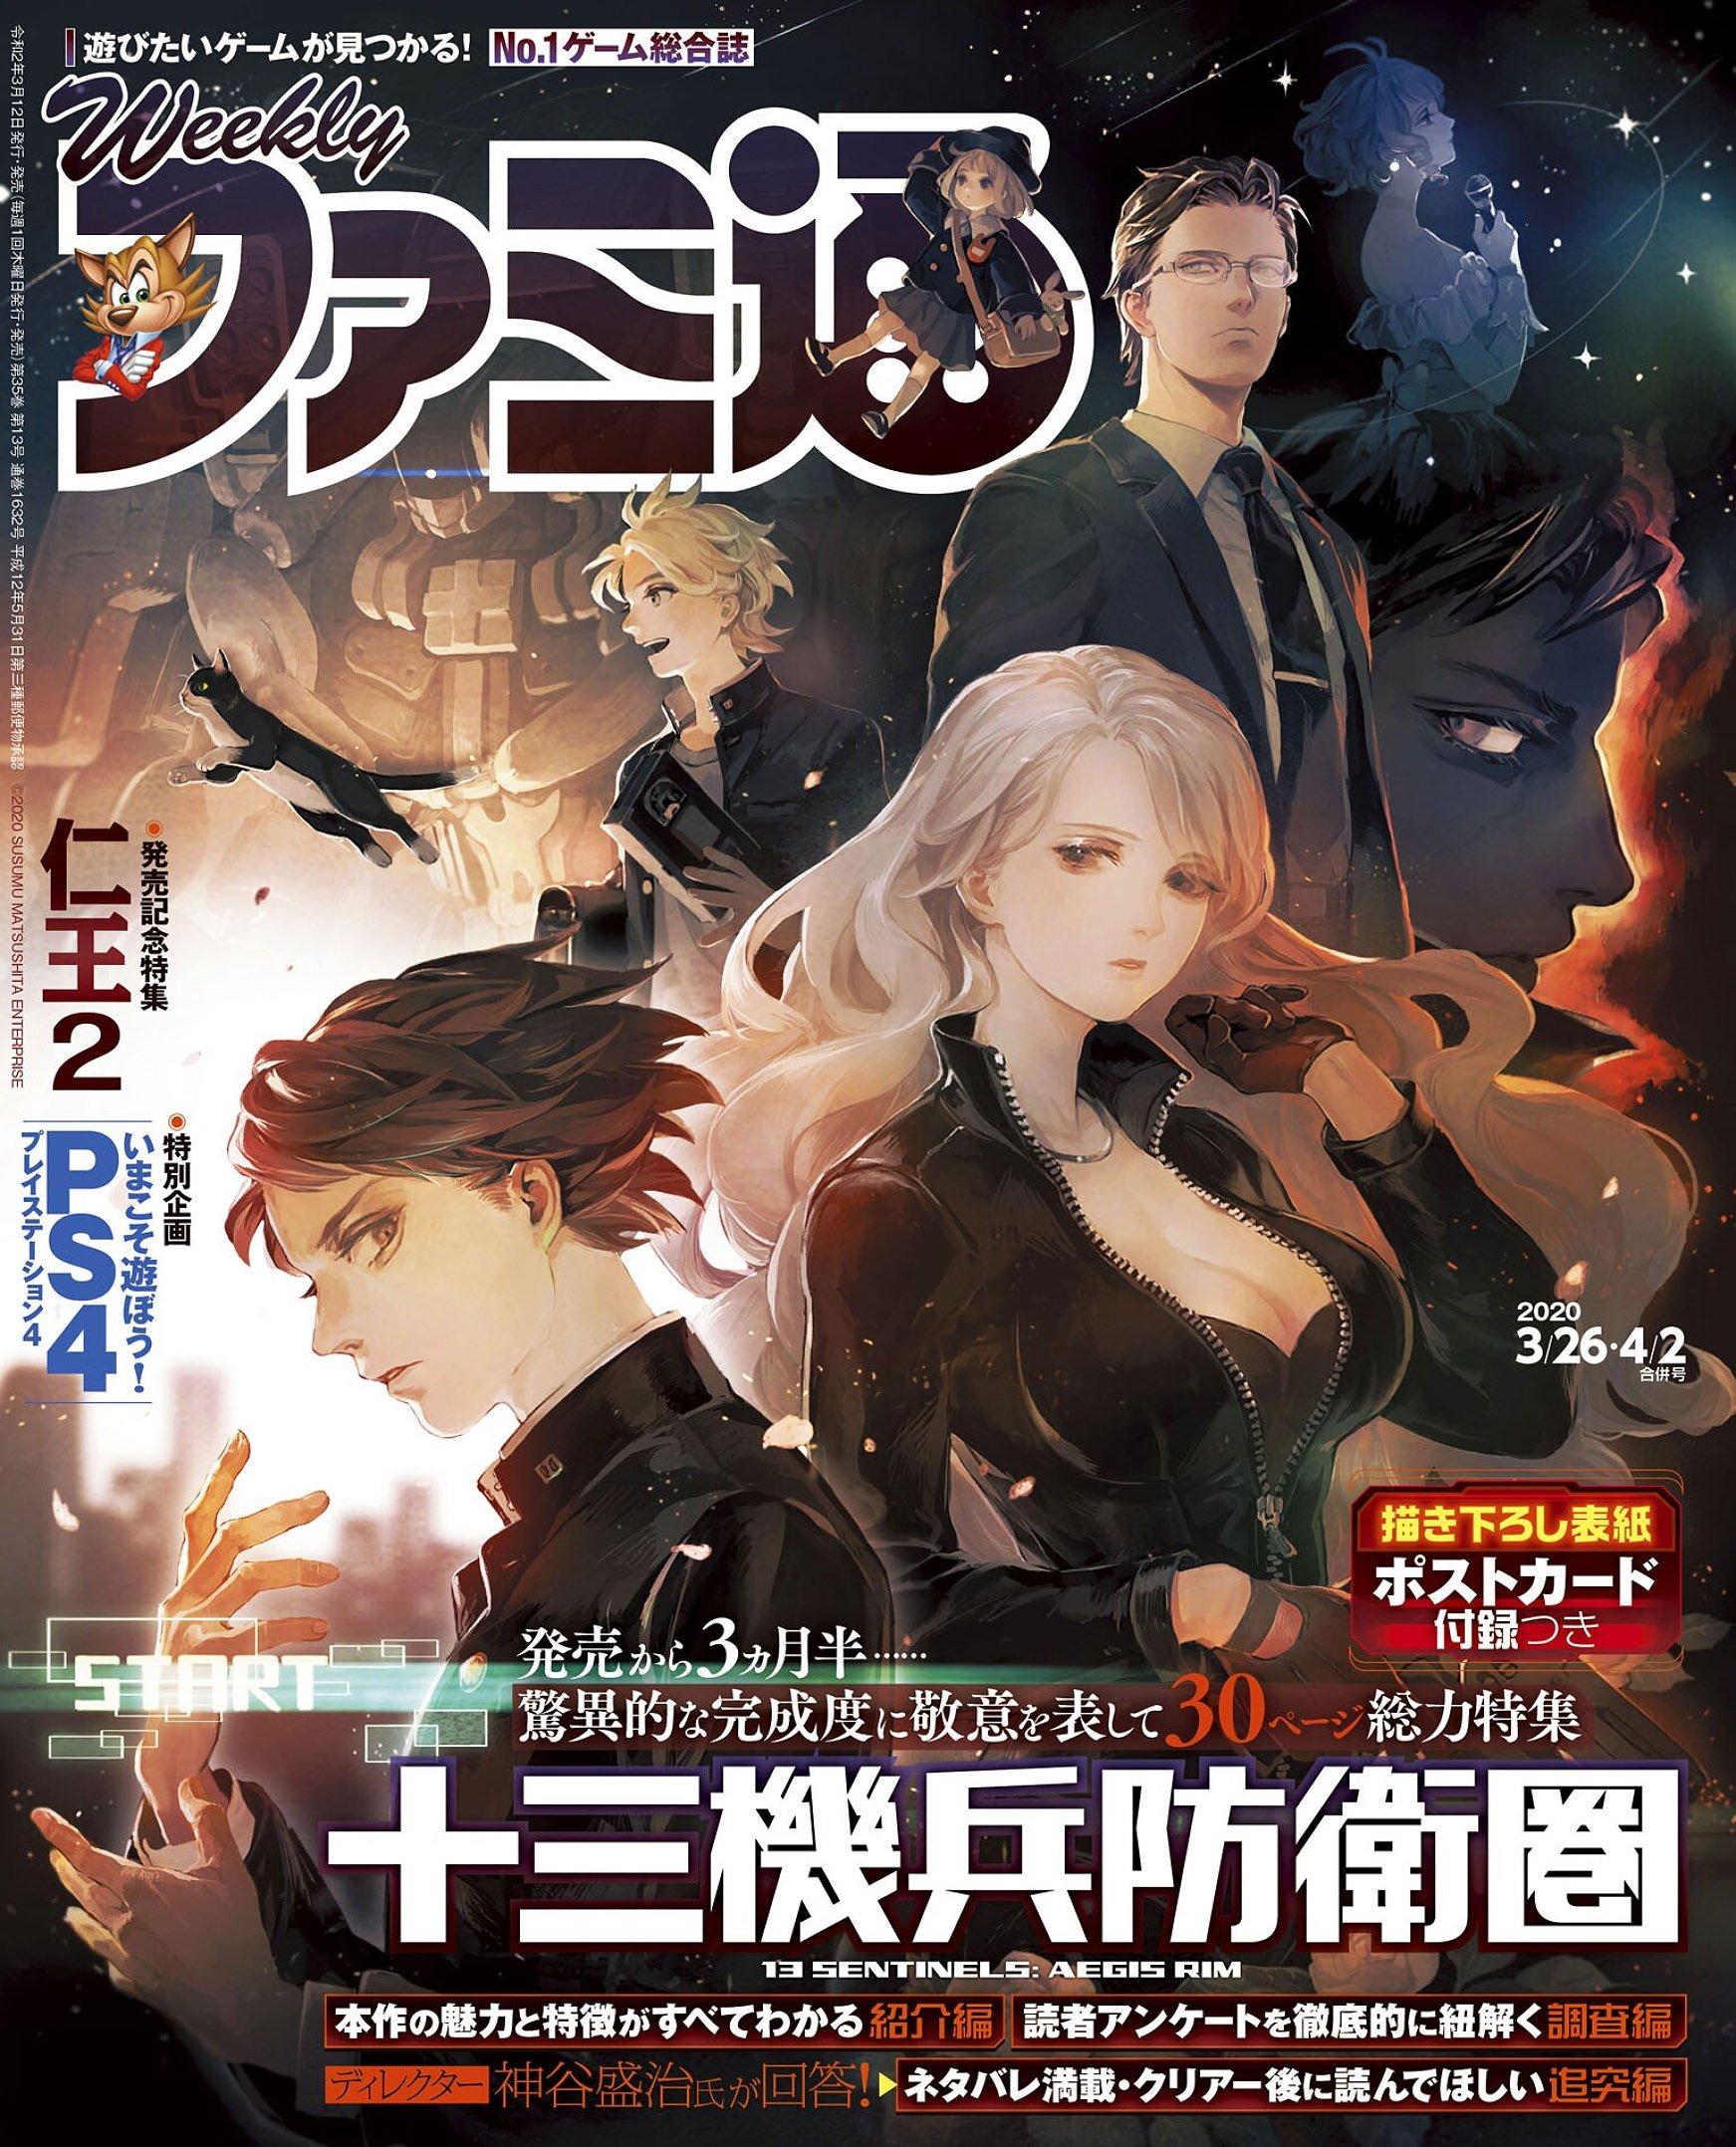 Famitsu 1632 (March 26/April 2, 2020)